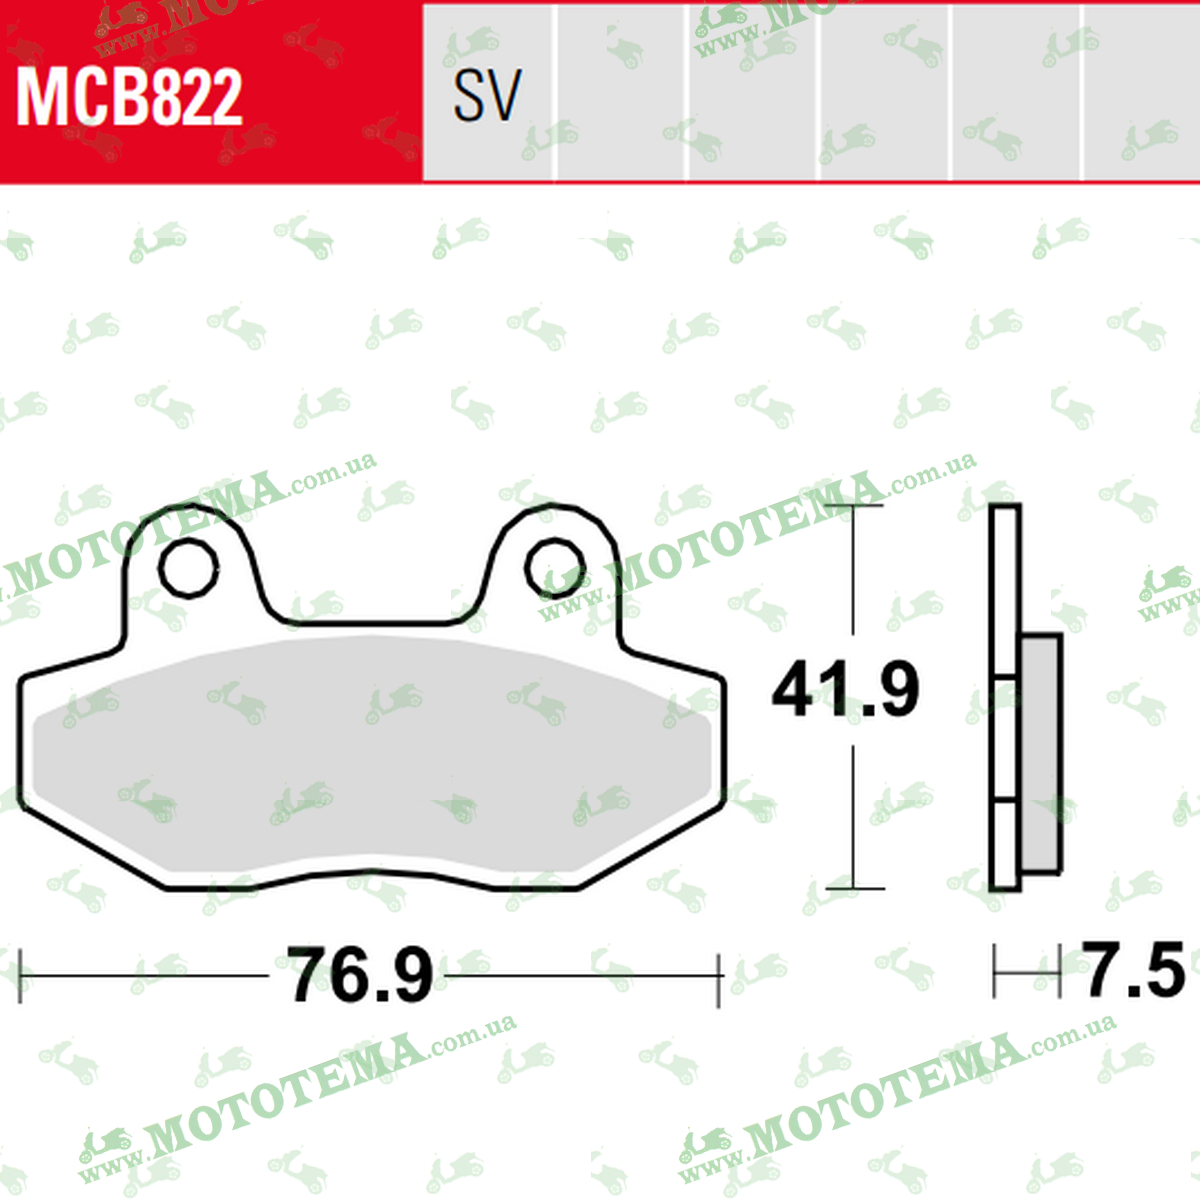 kolodki-tormoznye-trw-lucas-mcb822-1200x